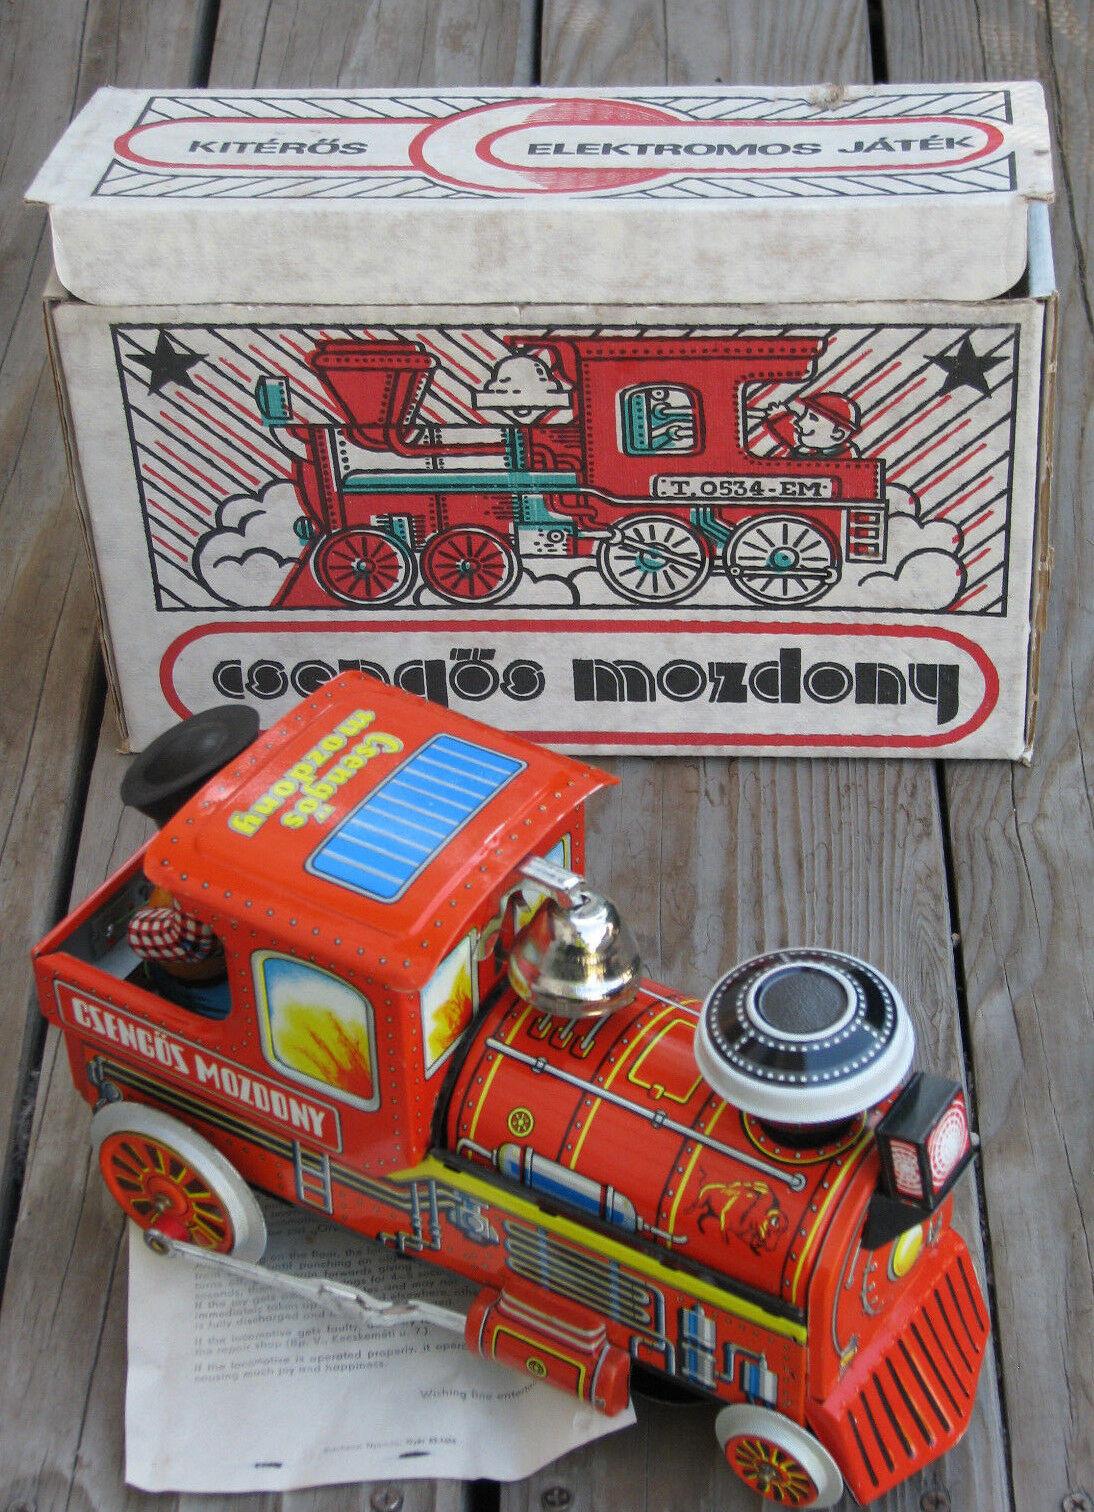 CSENGOS MOZDONY 1988 Bell Bell Bell Ringer 10½  Tin Toy B O Locomotive Train  HUNGARY 2dc